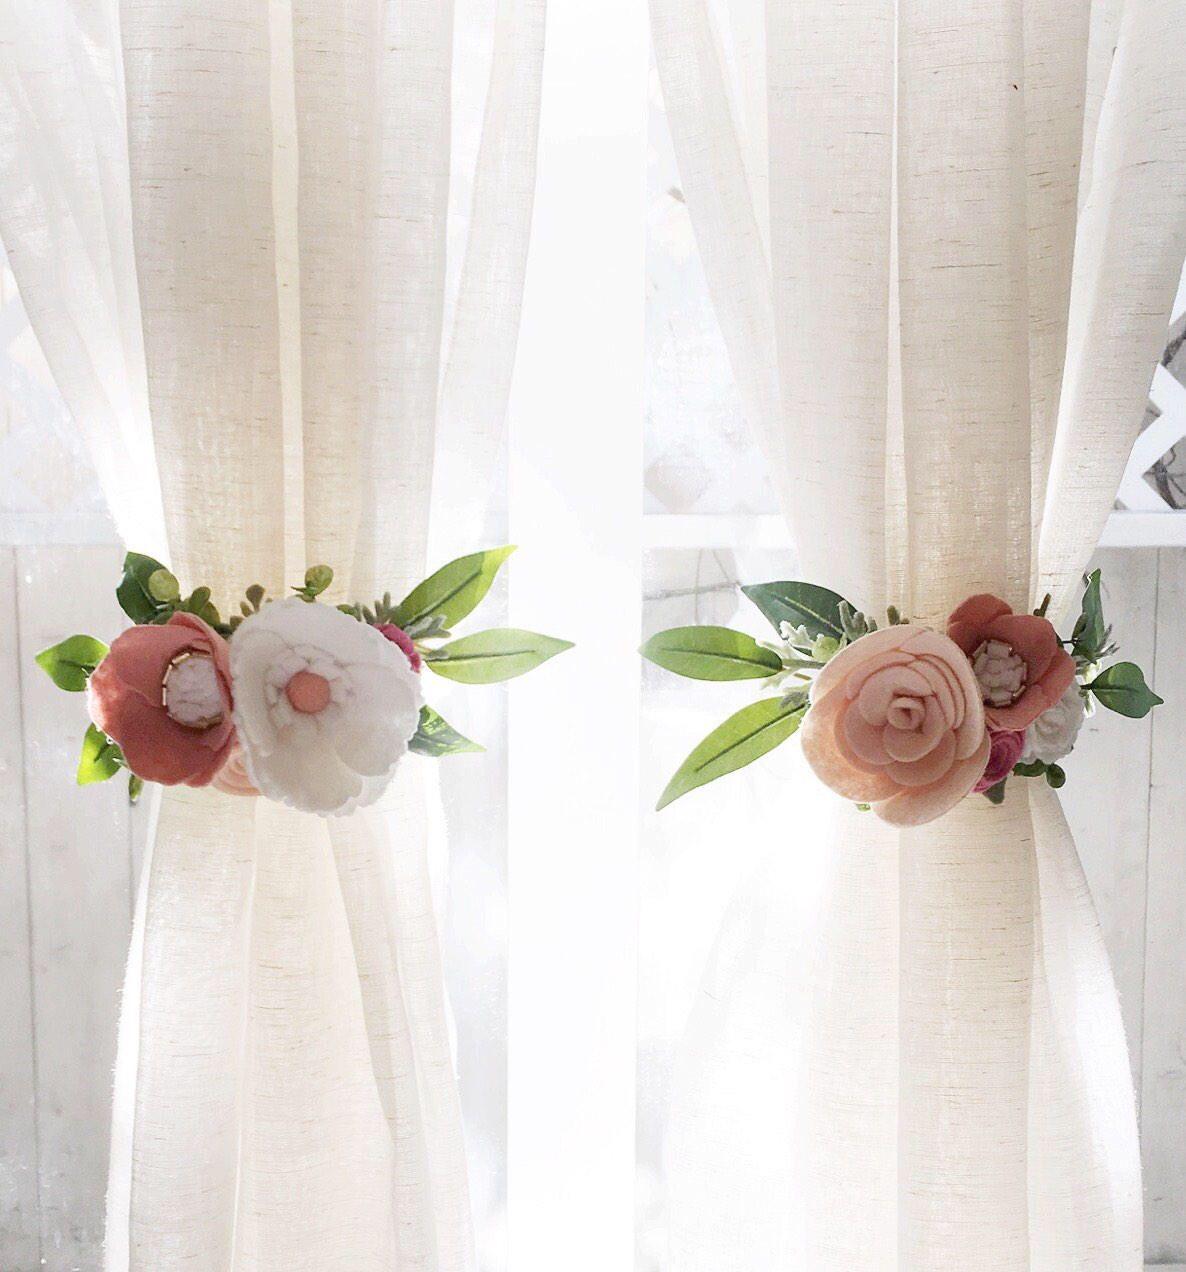 Floral Curtain Tie Backs.